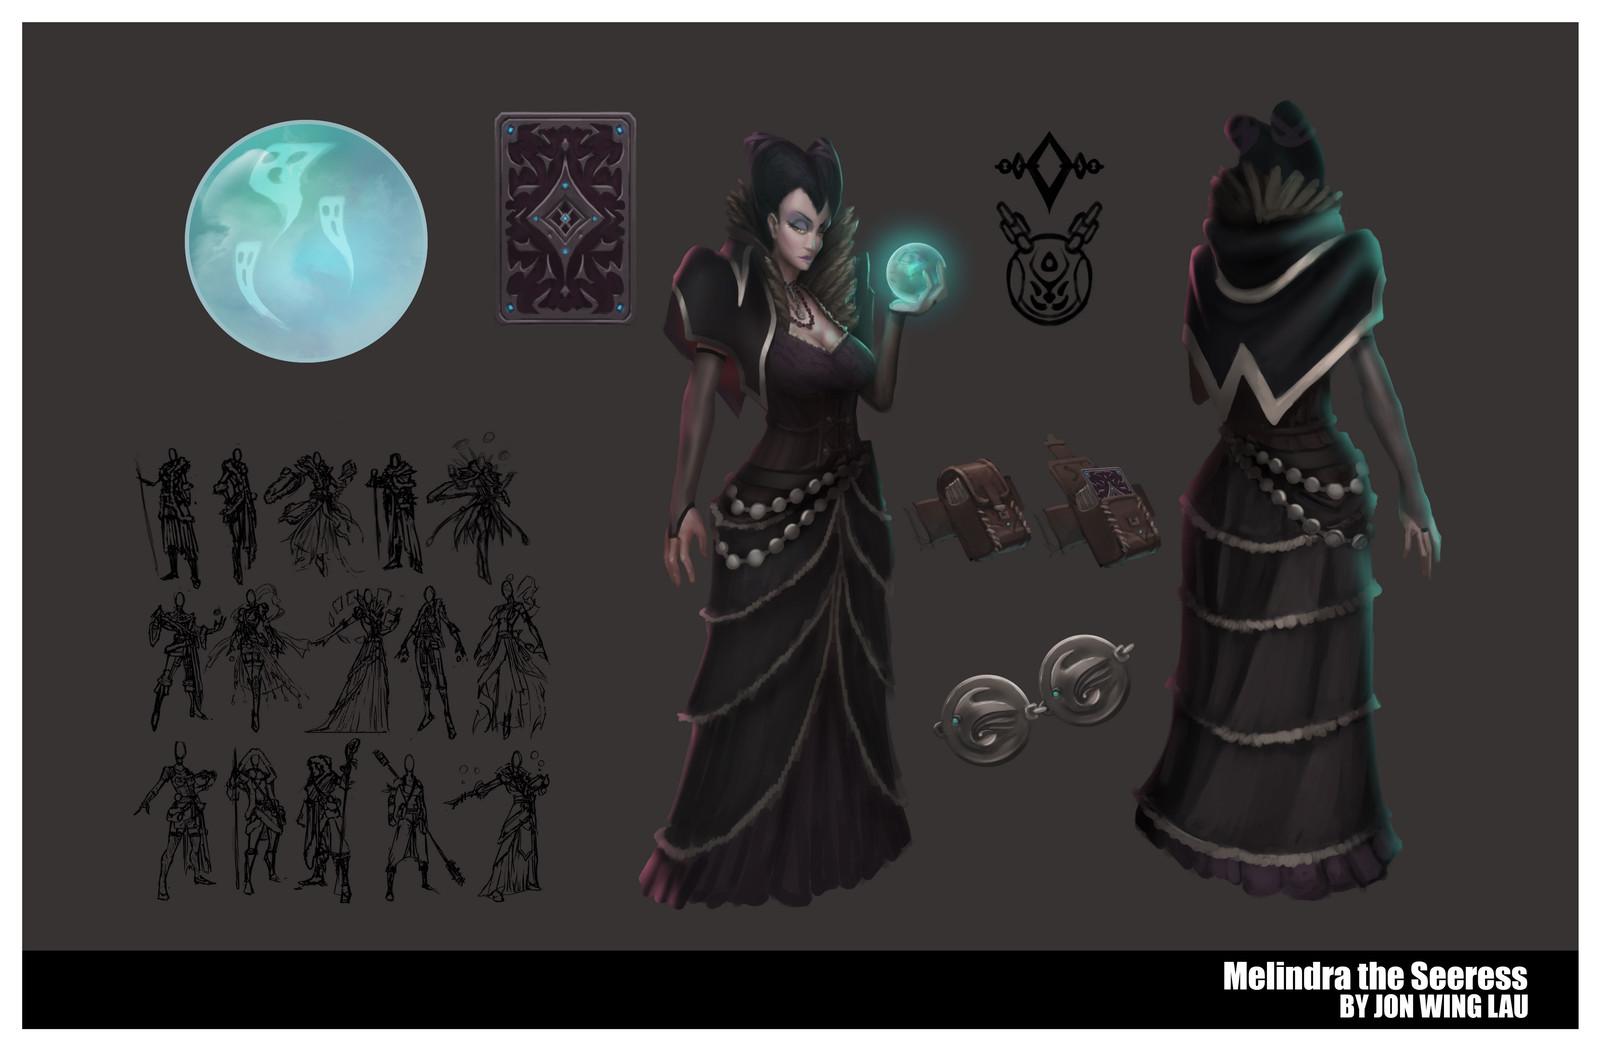 Melindra the Seeress